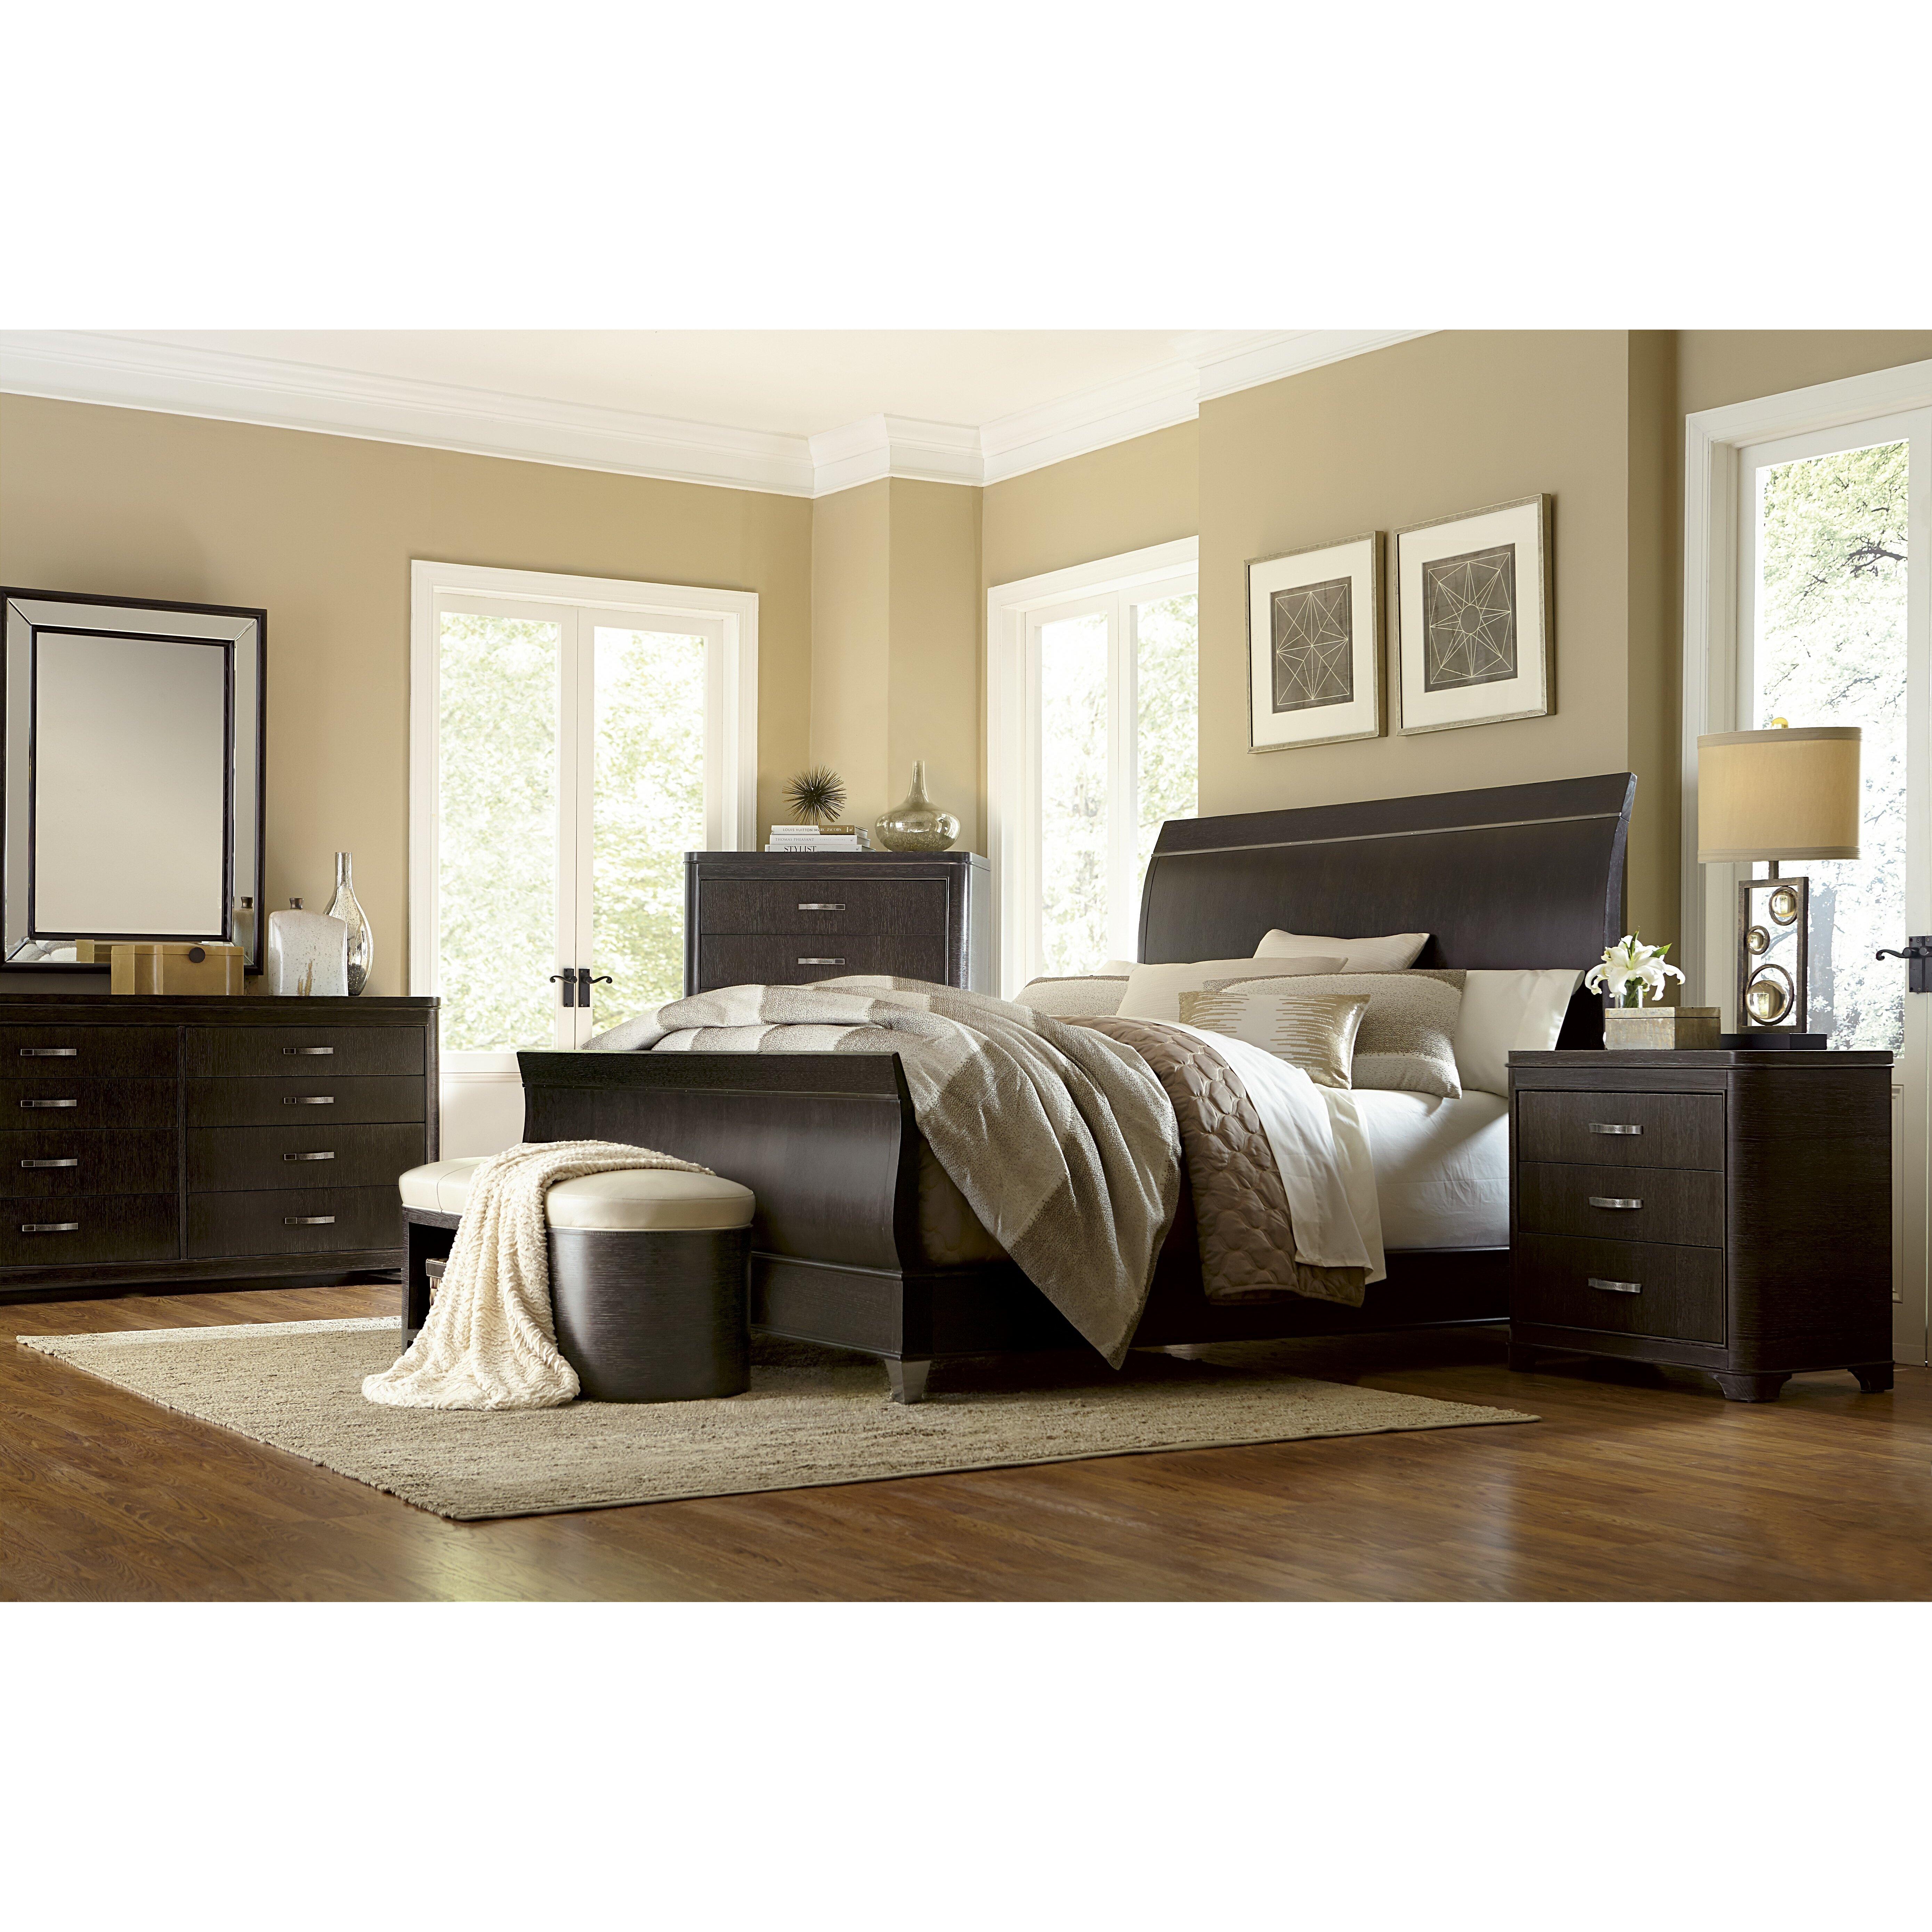 Sleigh Bedroom Sets : Greenpoint Sleigh Customizable Bedroom Set  Wayfair